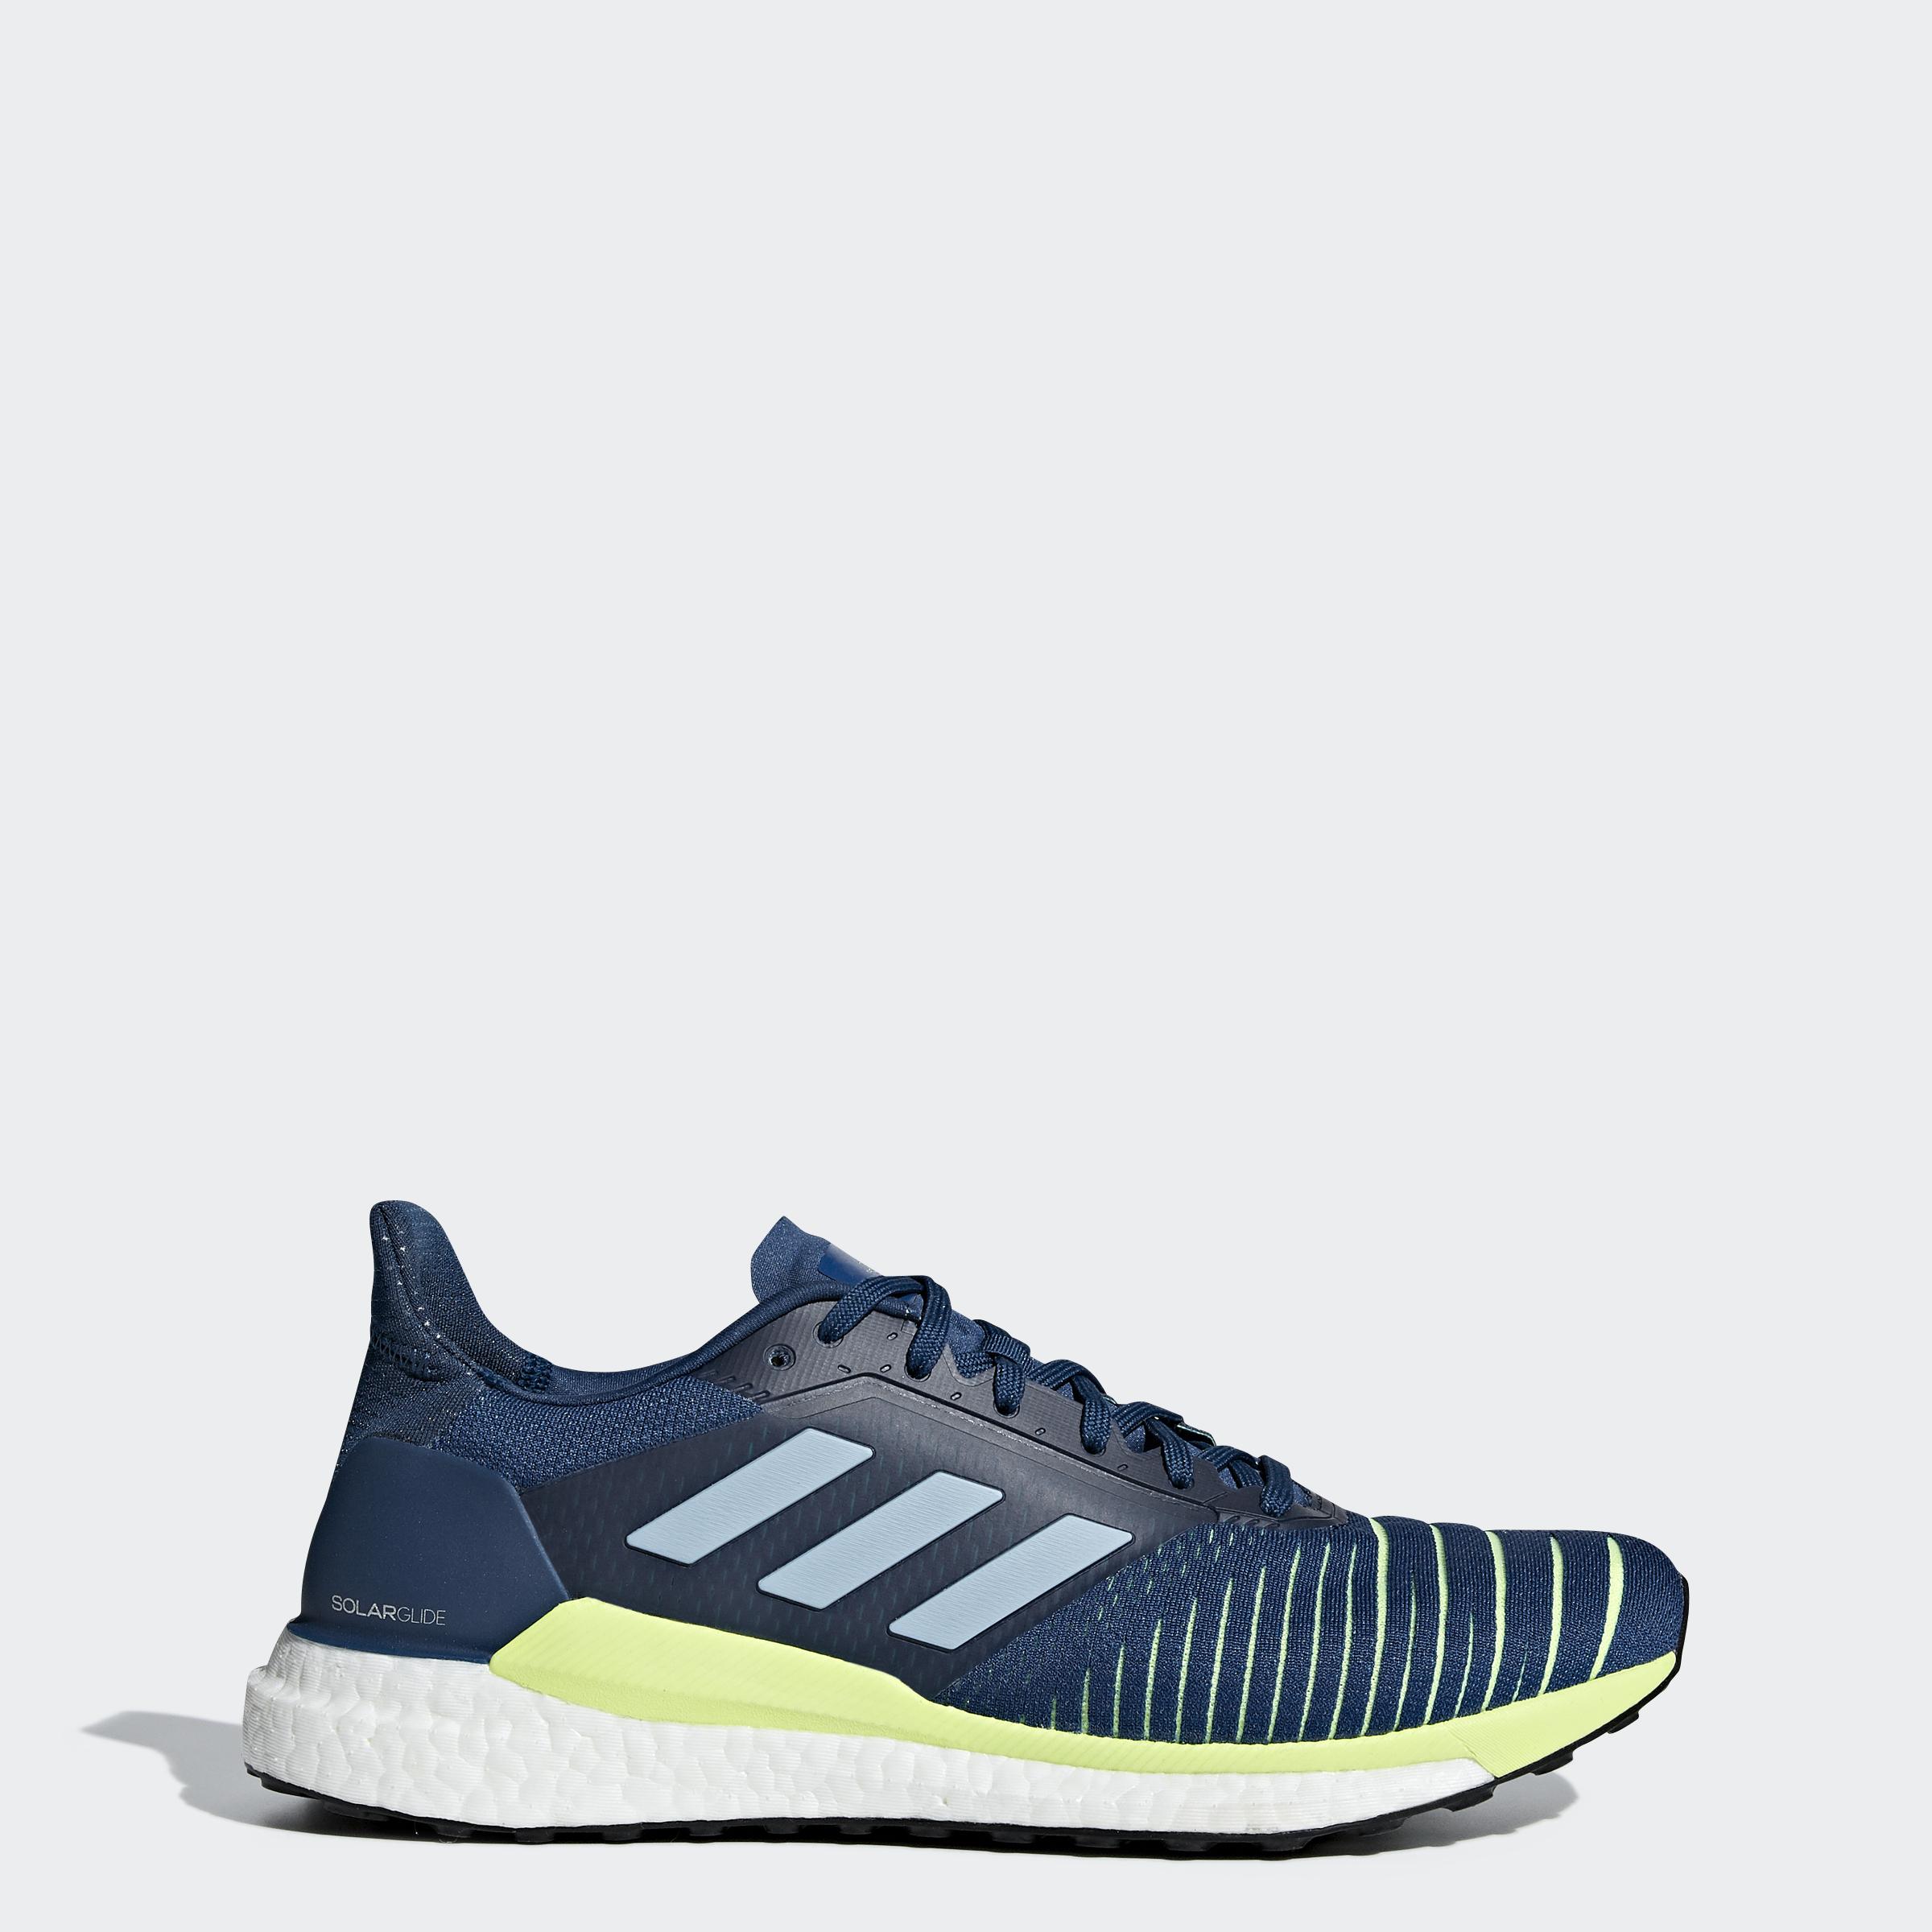 adidas-Solar-Glide-Shoes-Men-039-s thumbnail 10